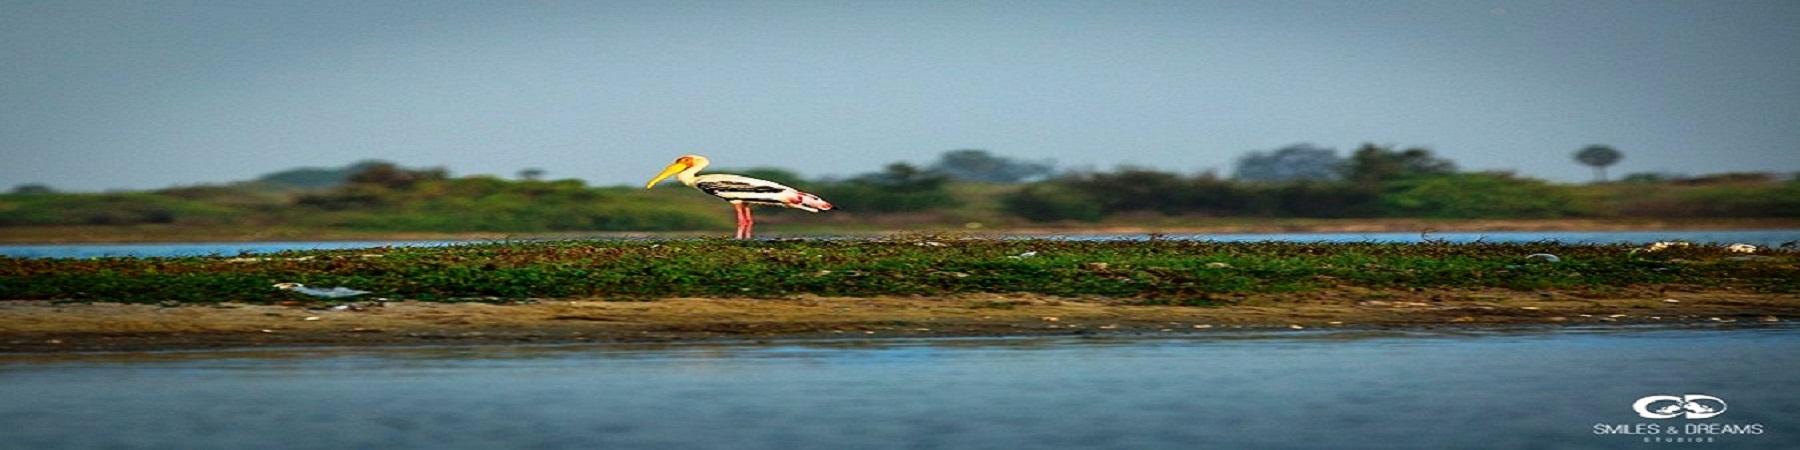 Tiruvallur District | Tamil Nadu | Land of Lakes | India